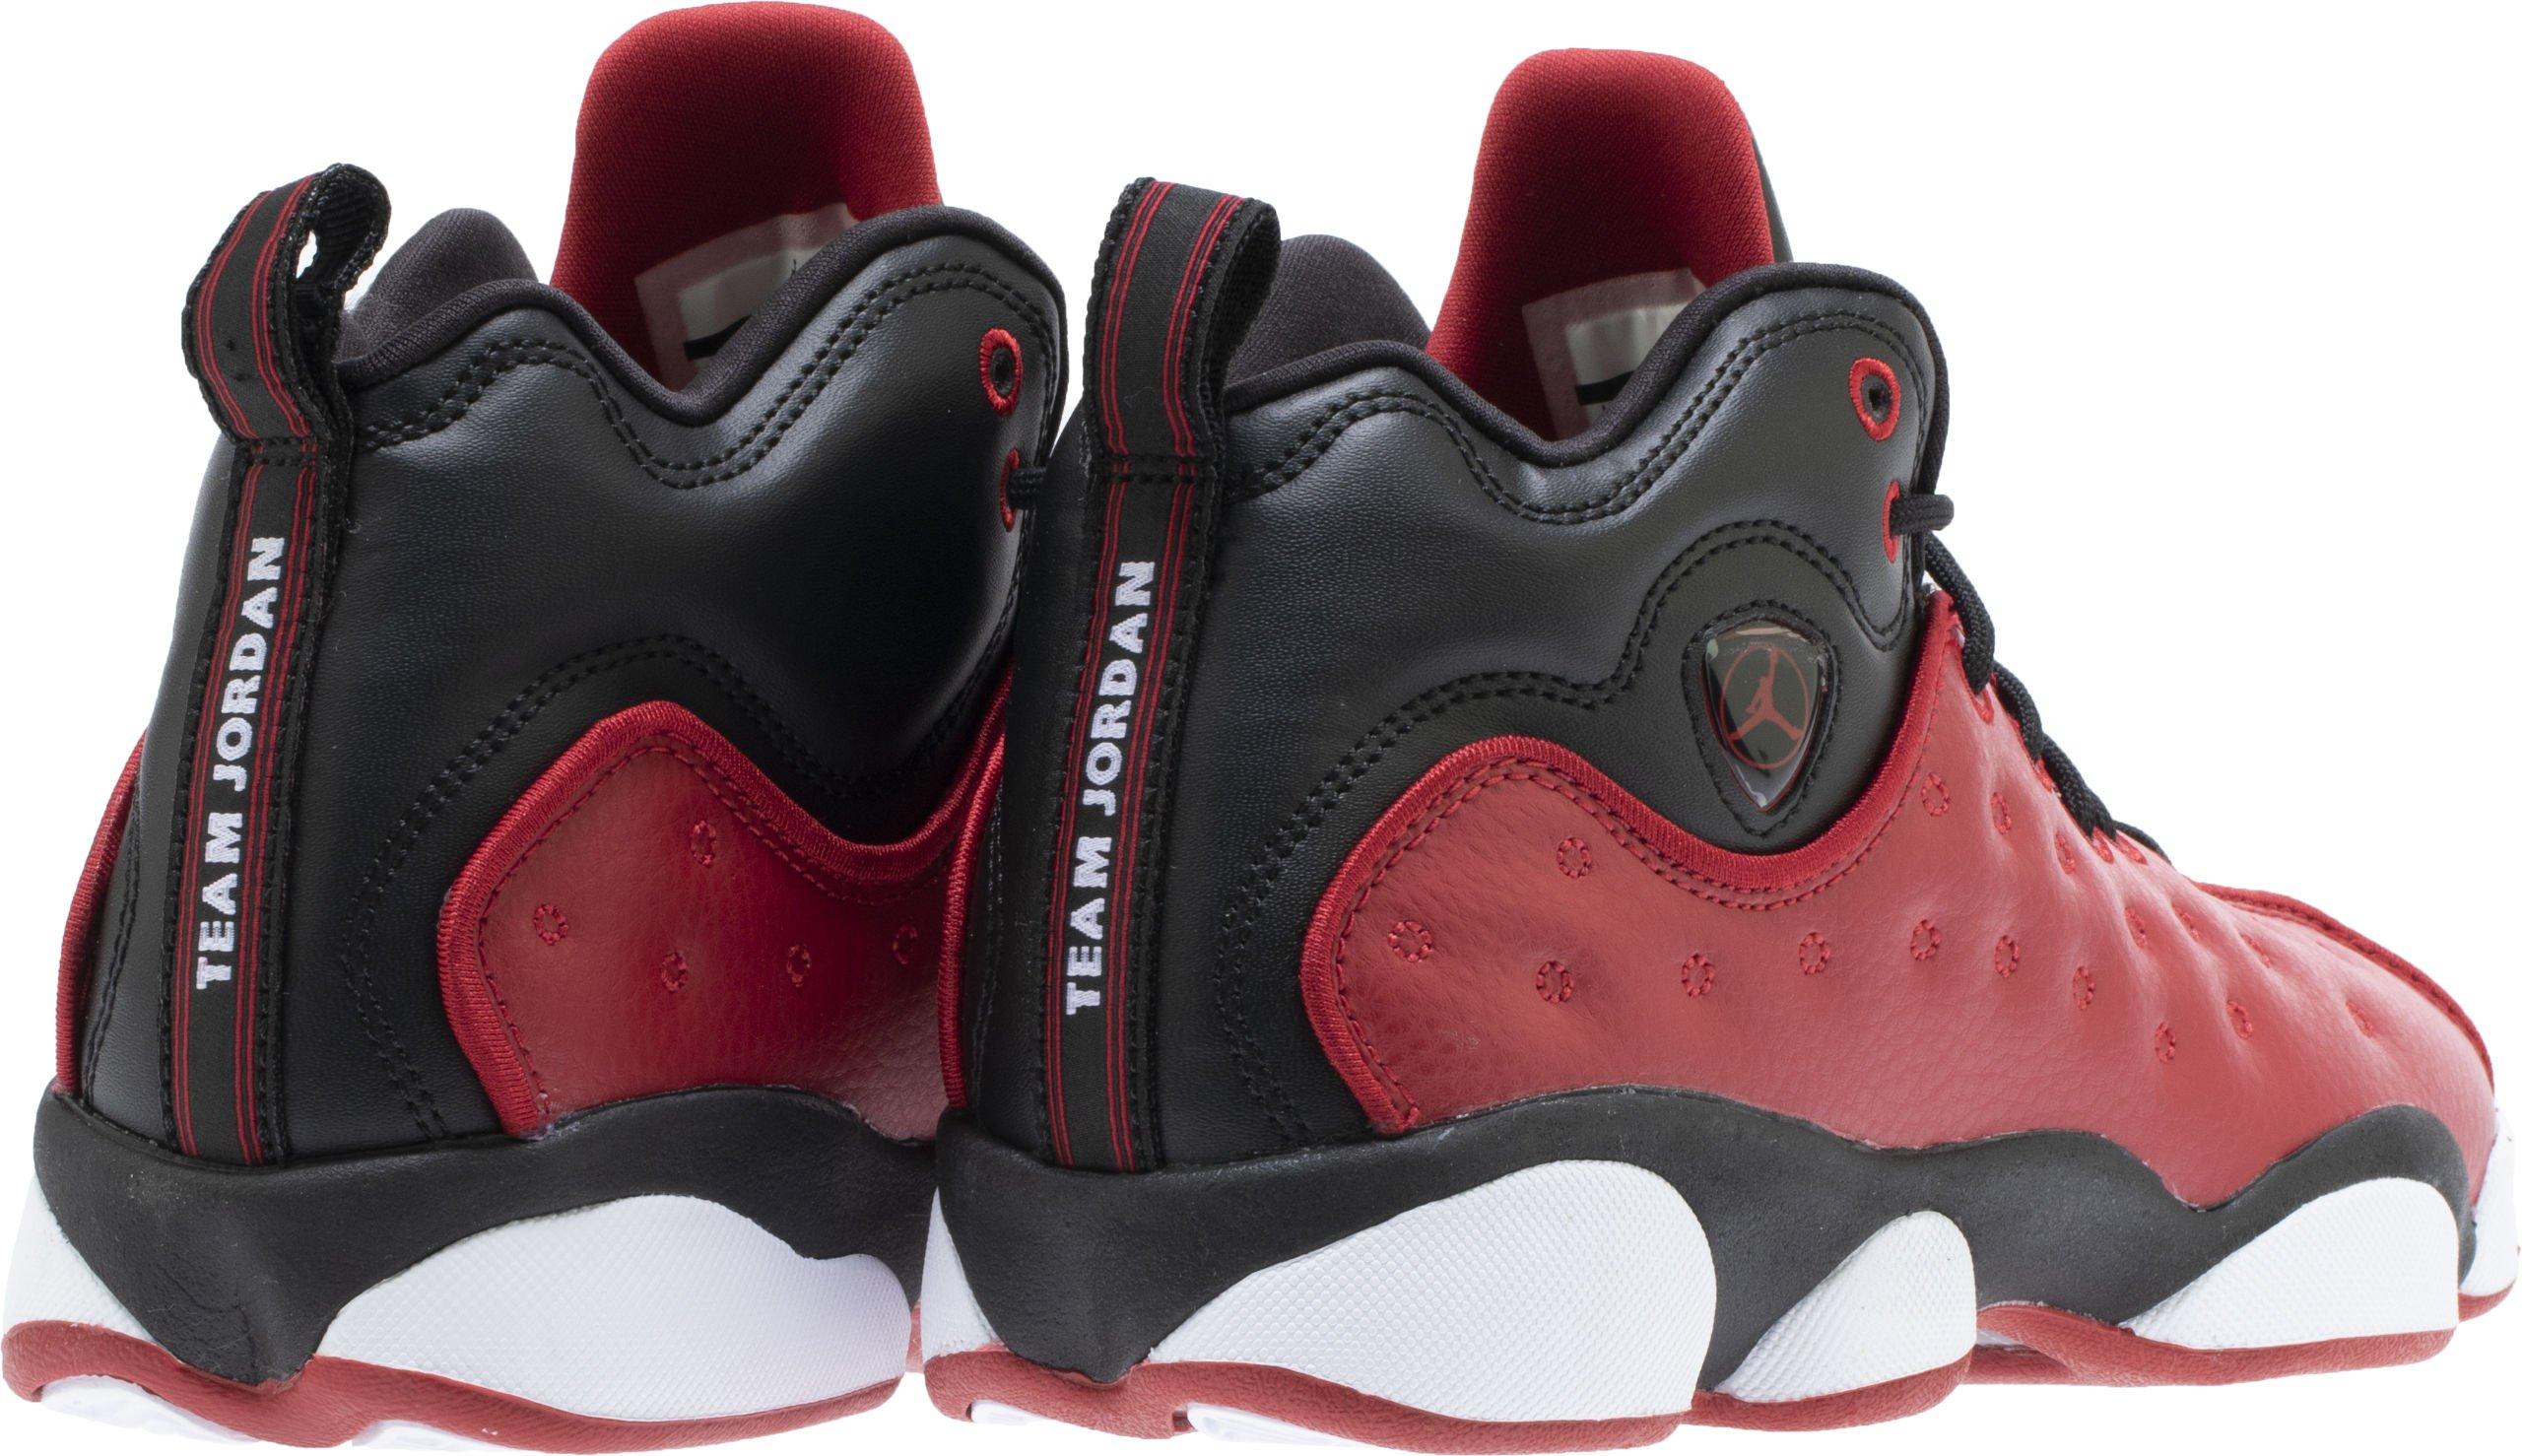 Jordan Kids Jumpman Team II GS Gym RED Gym RED Black White Size 3.5 by Jordan (Image #4)